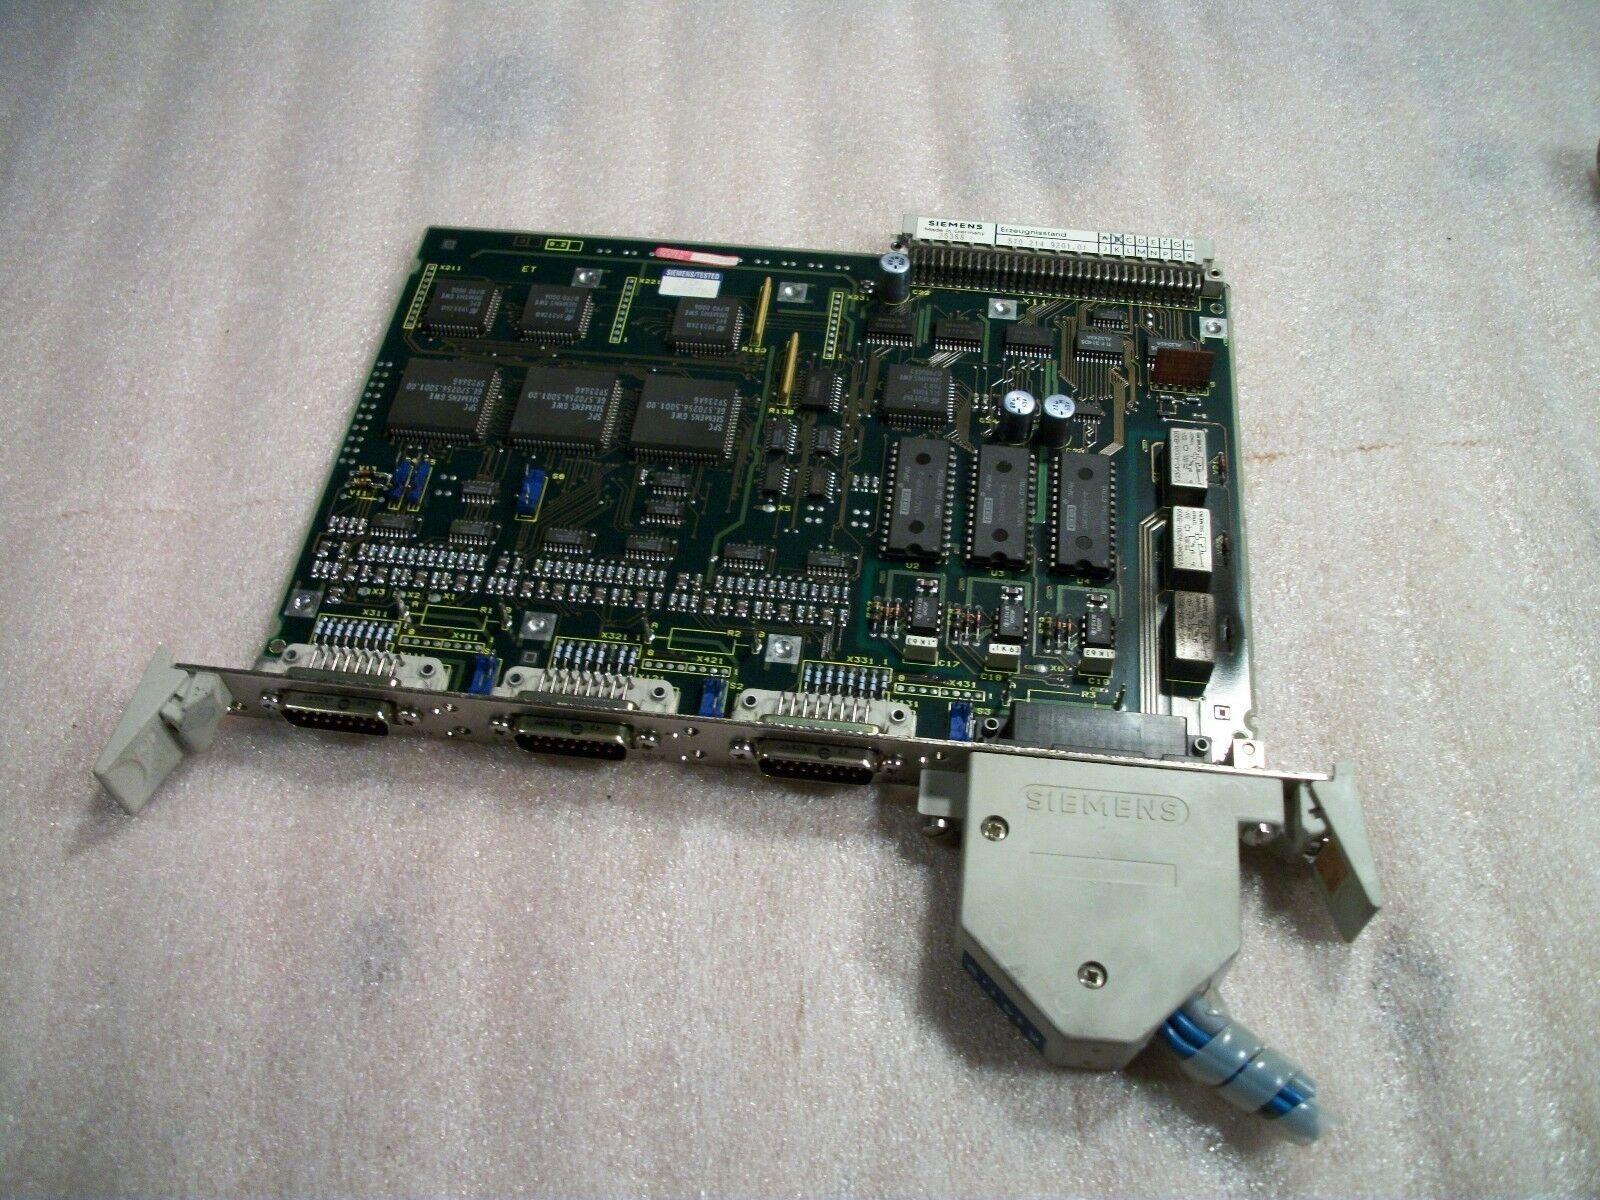 Siemens CNC Control Circuit Board 570 214 9201.01 / OE 570214.0003.01